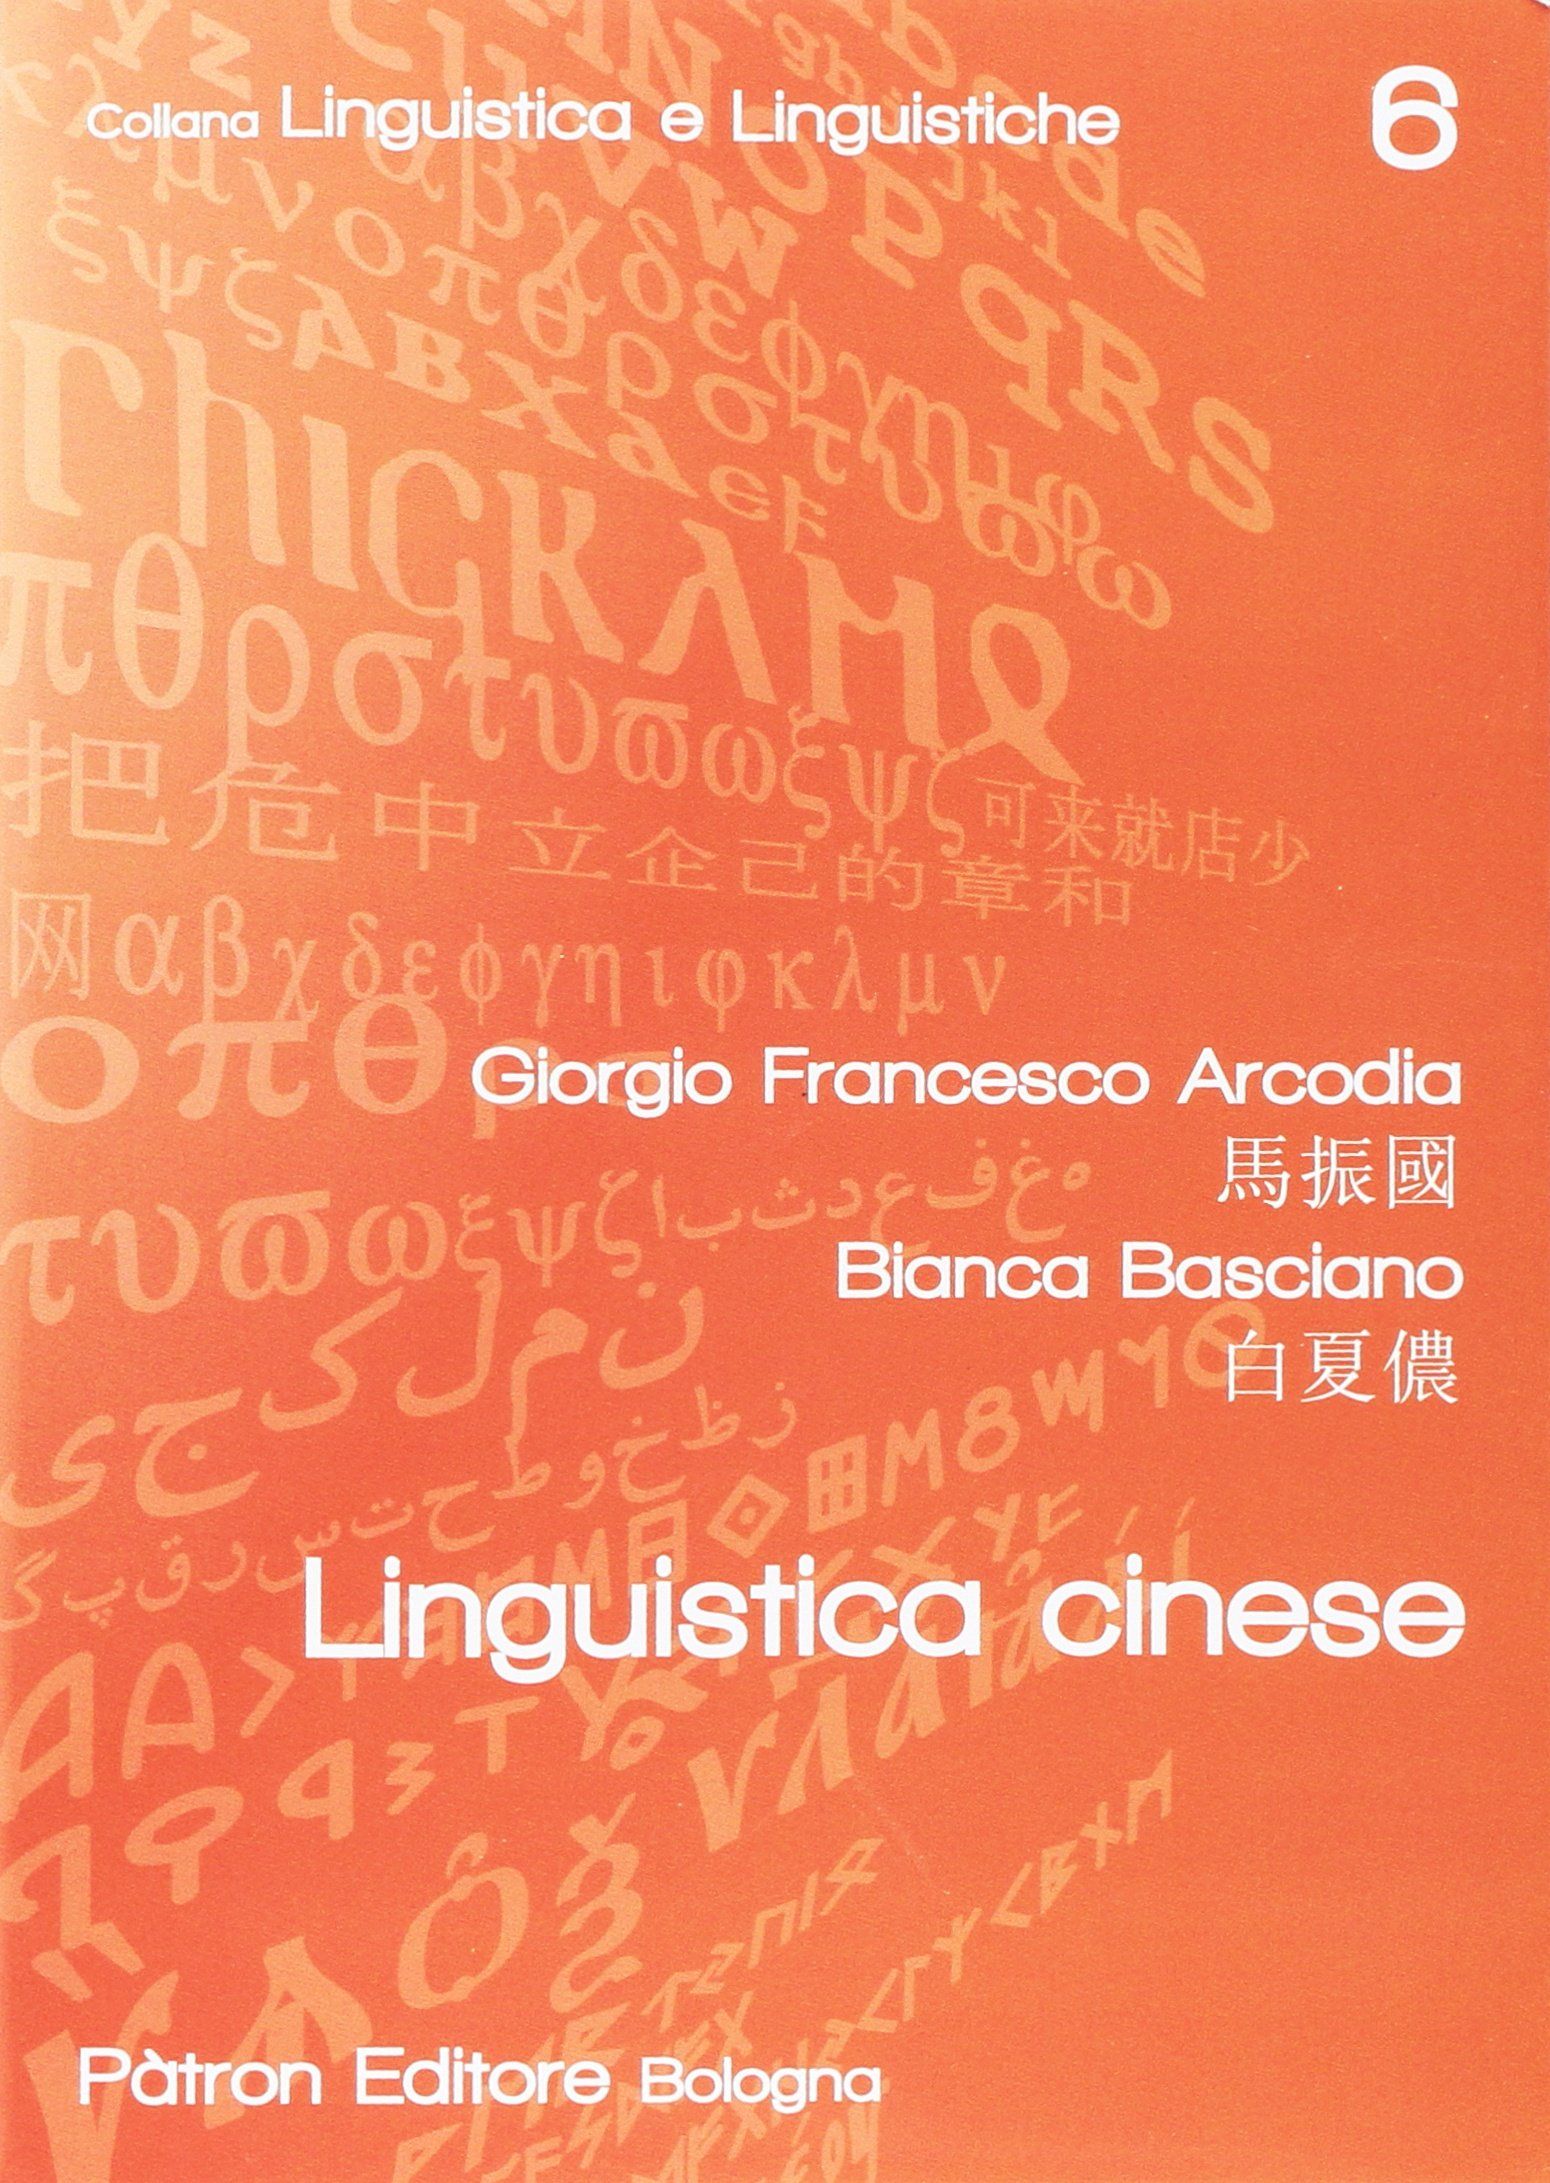 Linguistica cinese